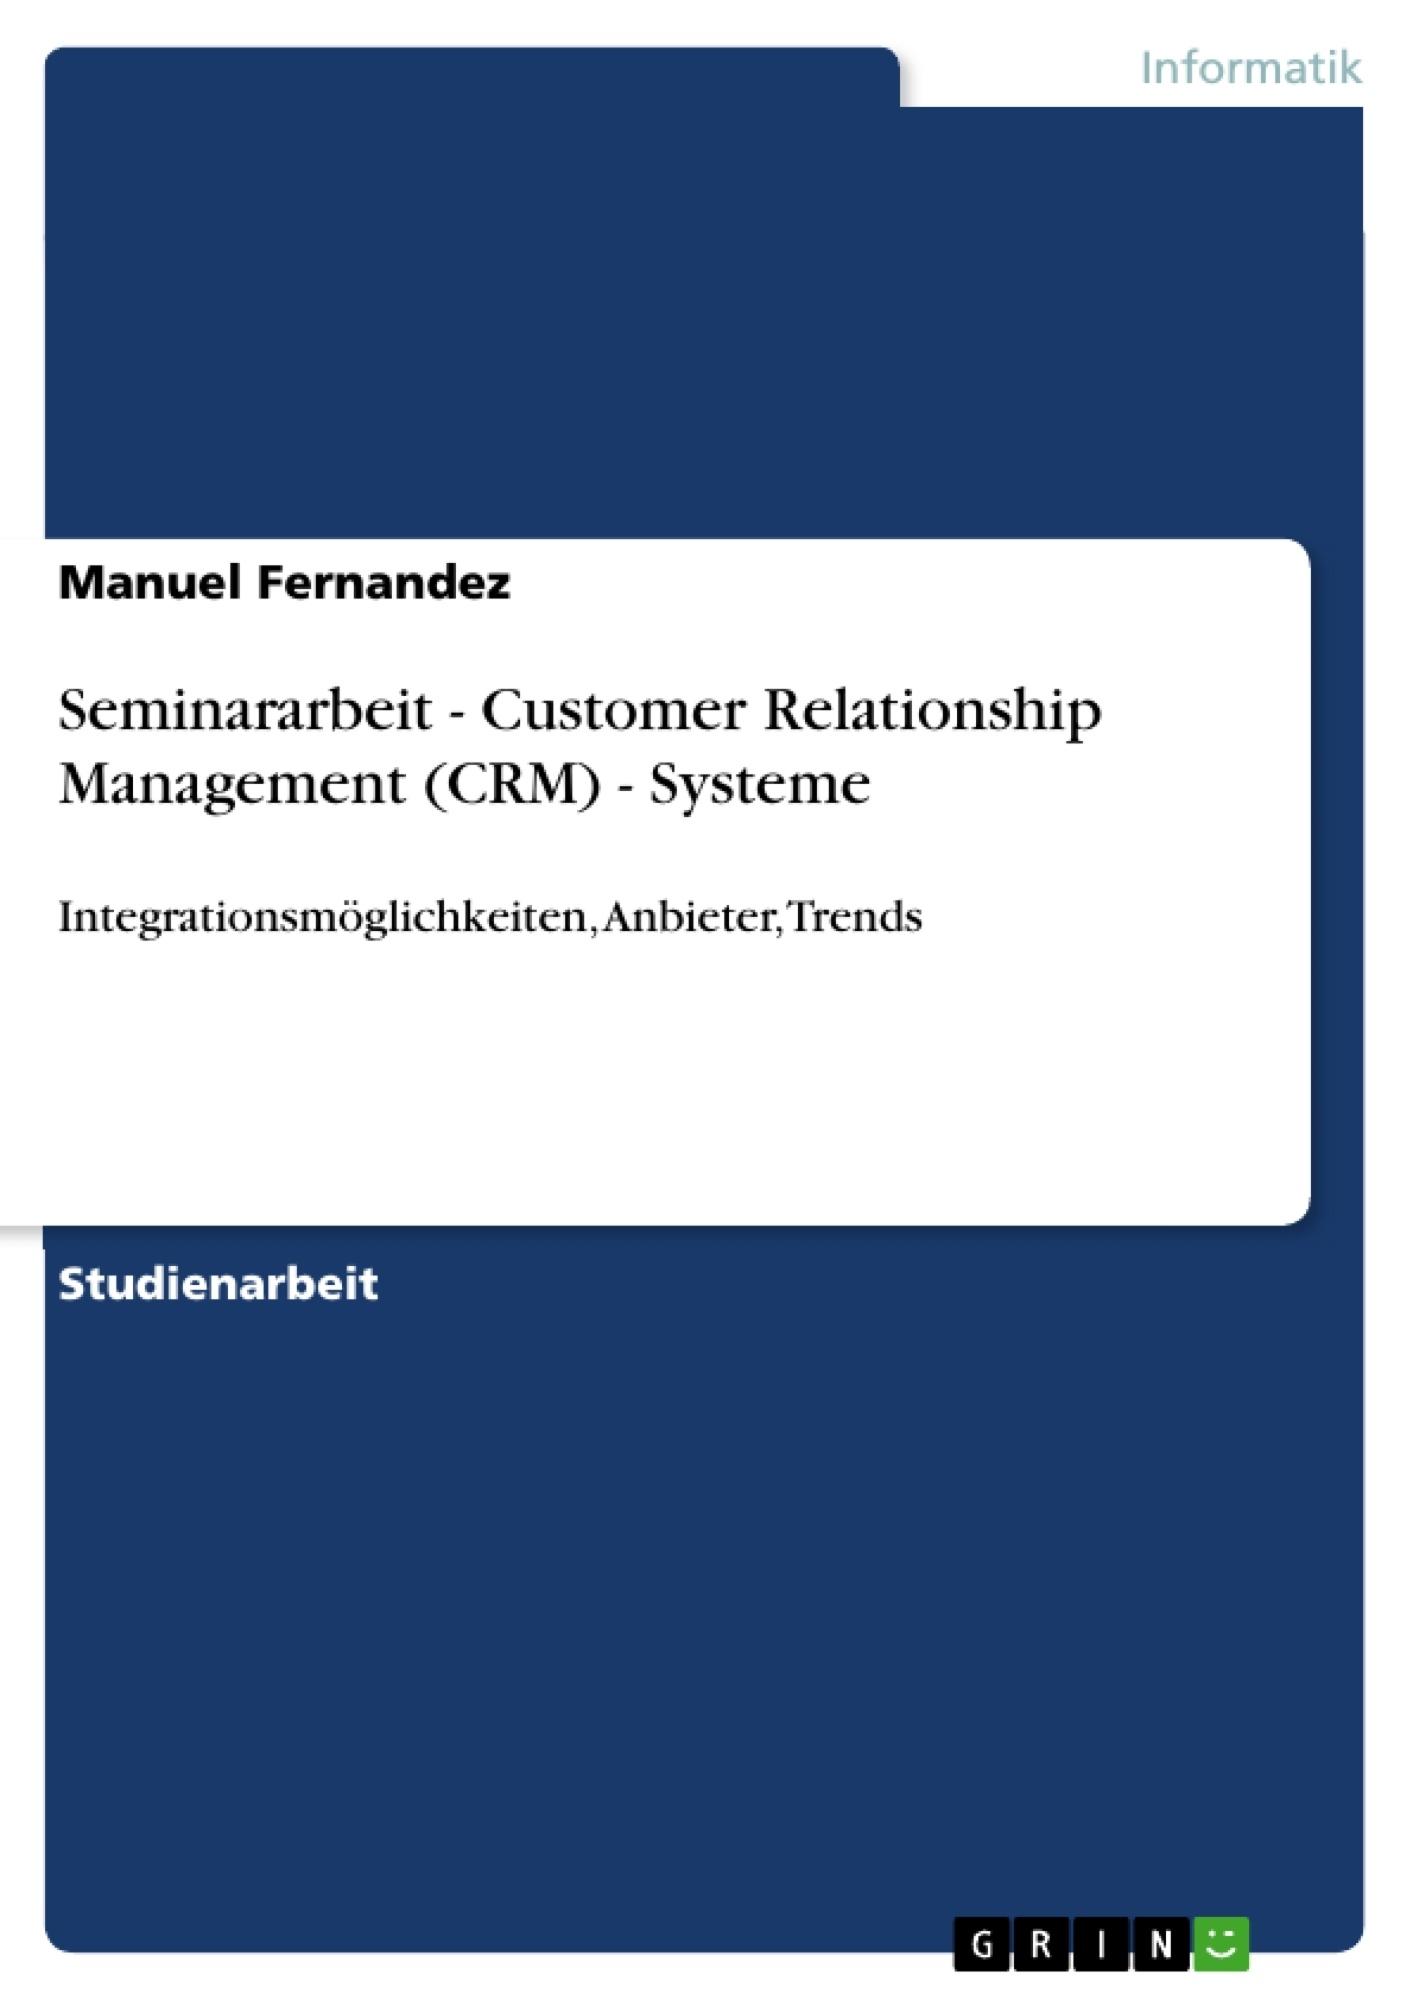 Titel: Seminararbeit - Customer Relationship Management (CRM) - Systeme